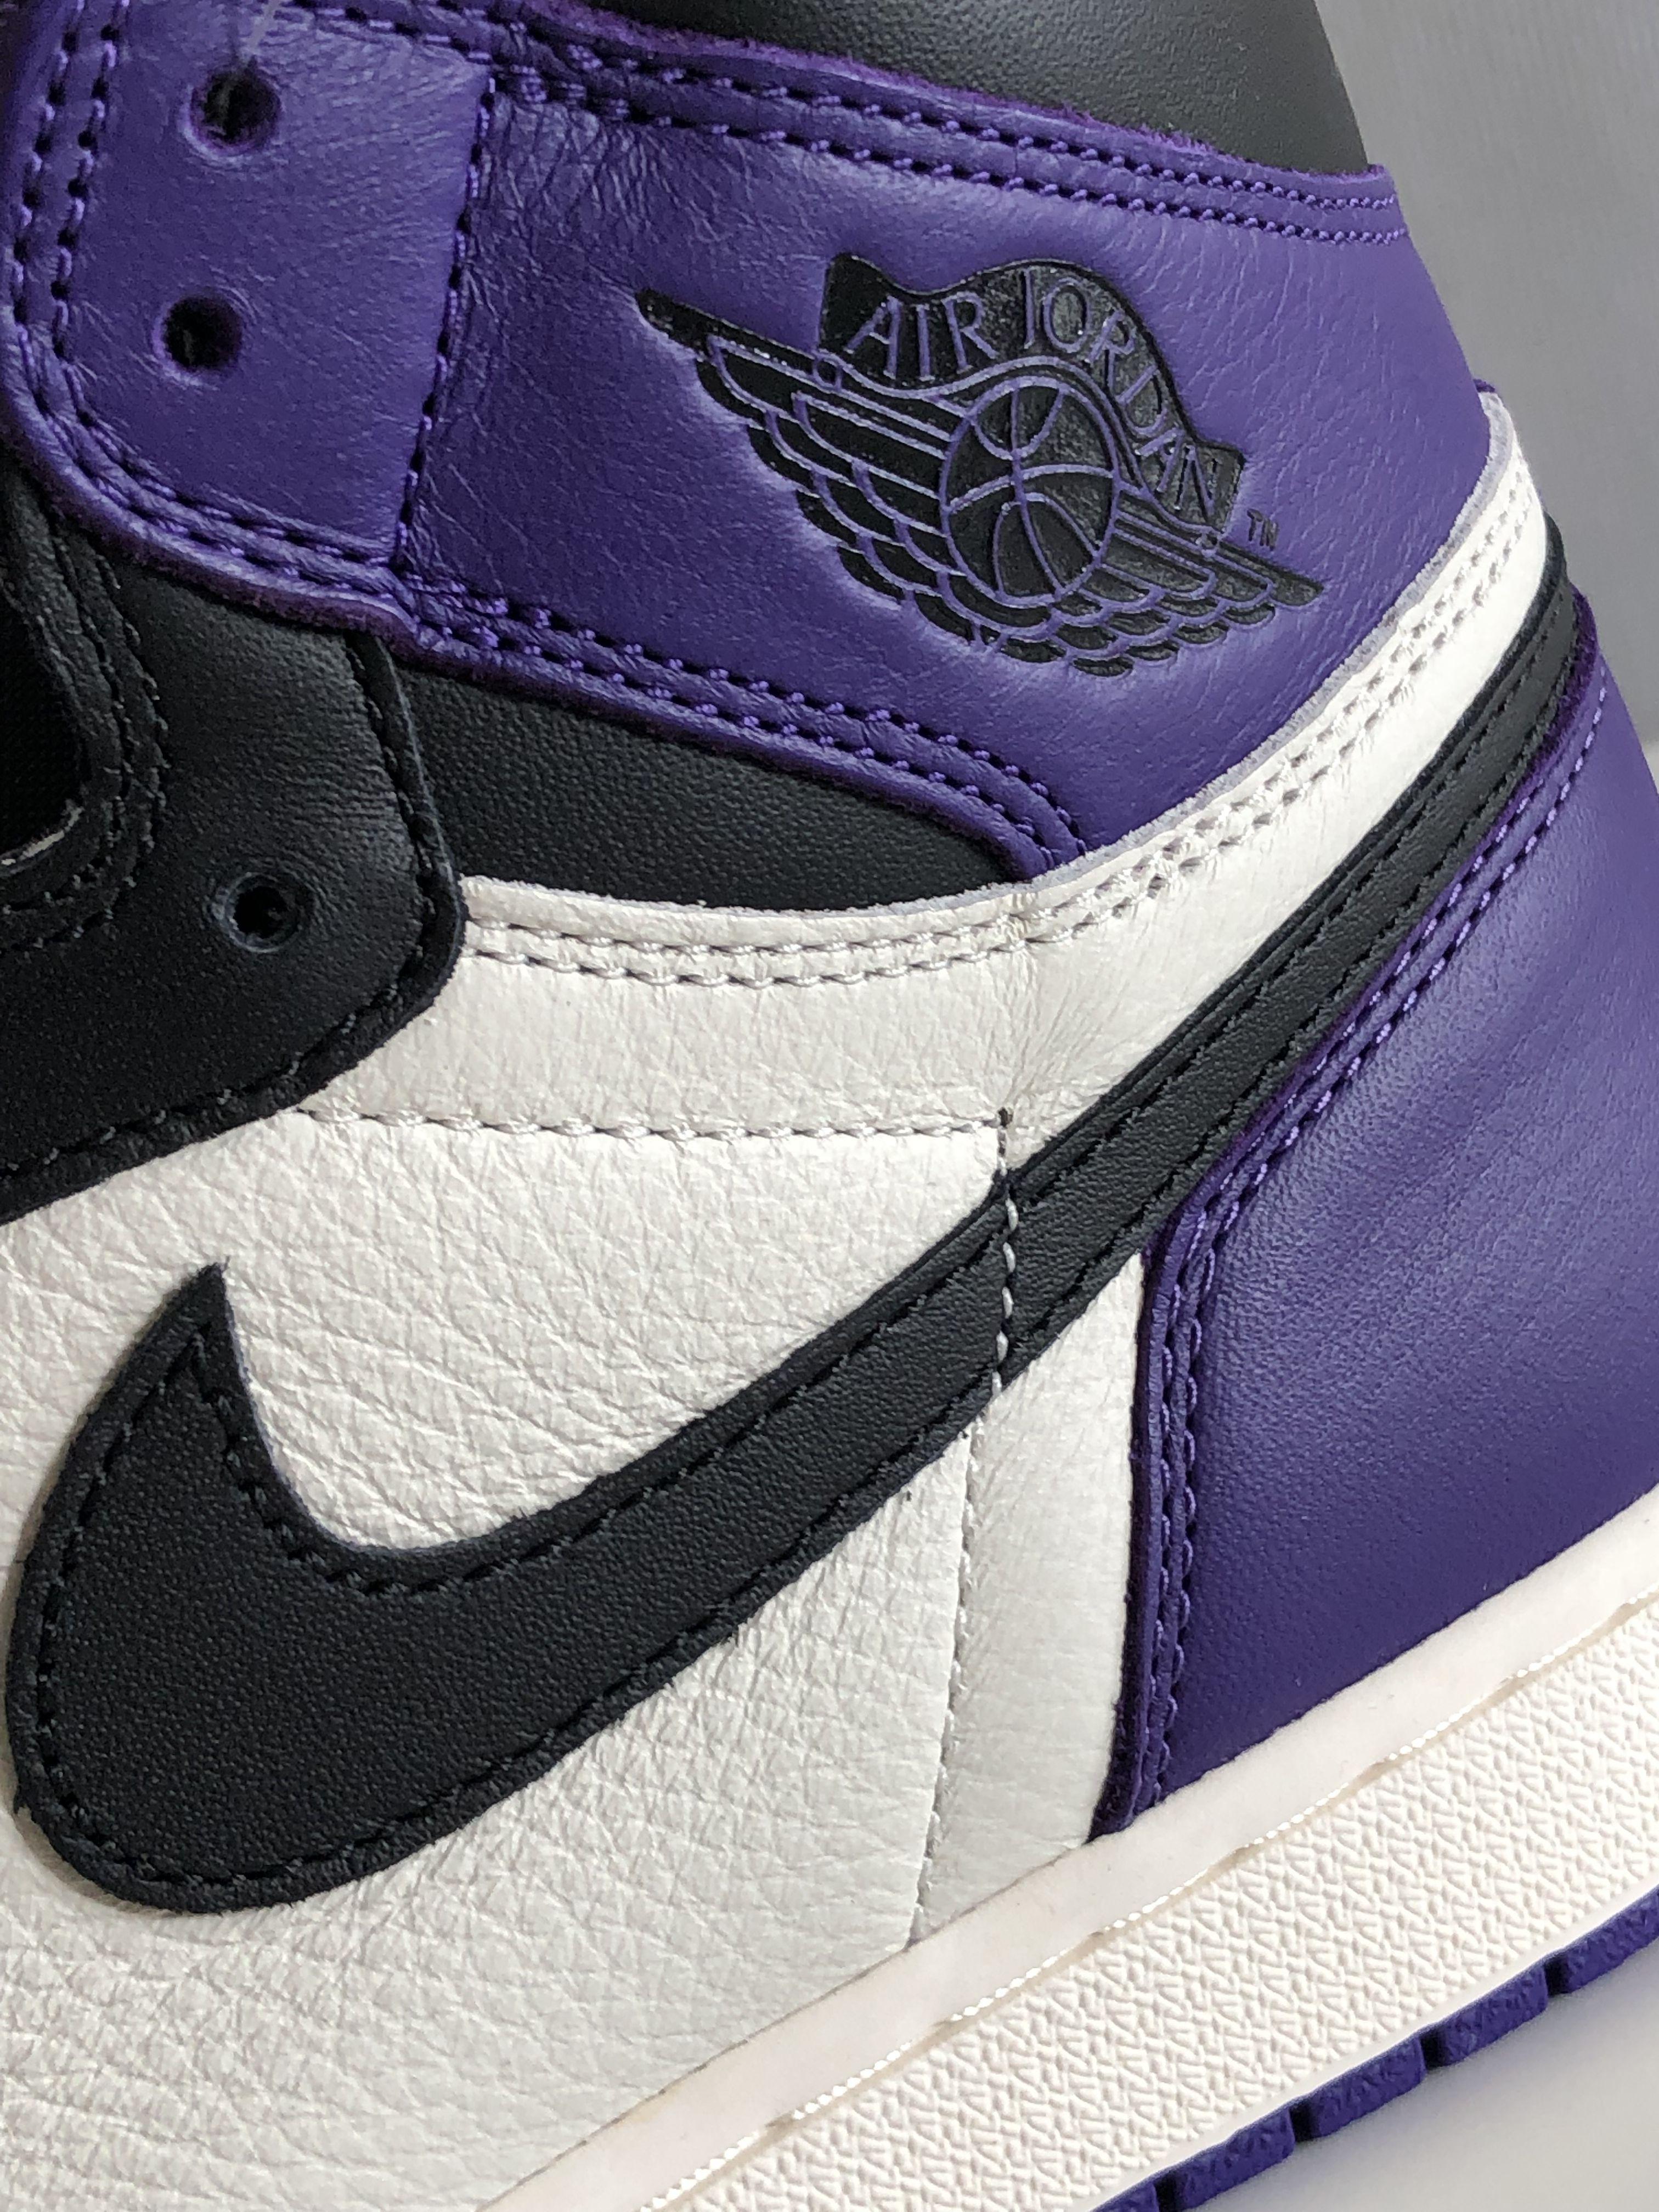 Jordan 1 Retro High Court Purple Jordan 1 Retro High Air